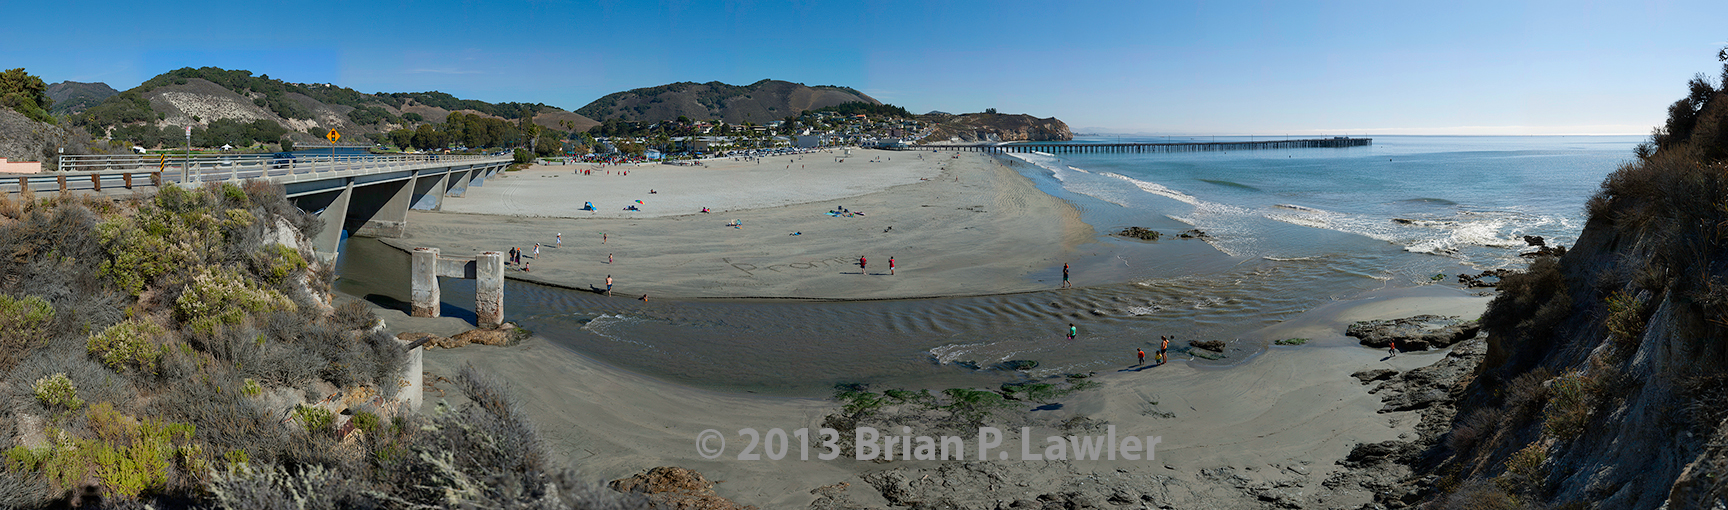 Avila Beach Panorama LR